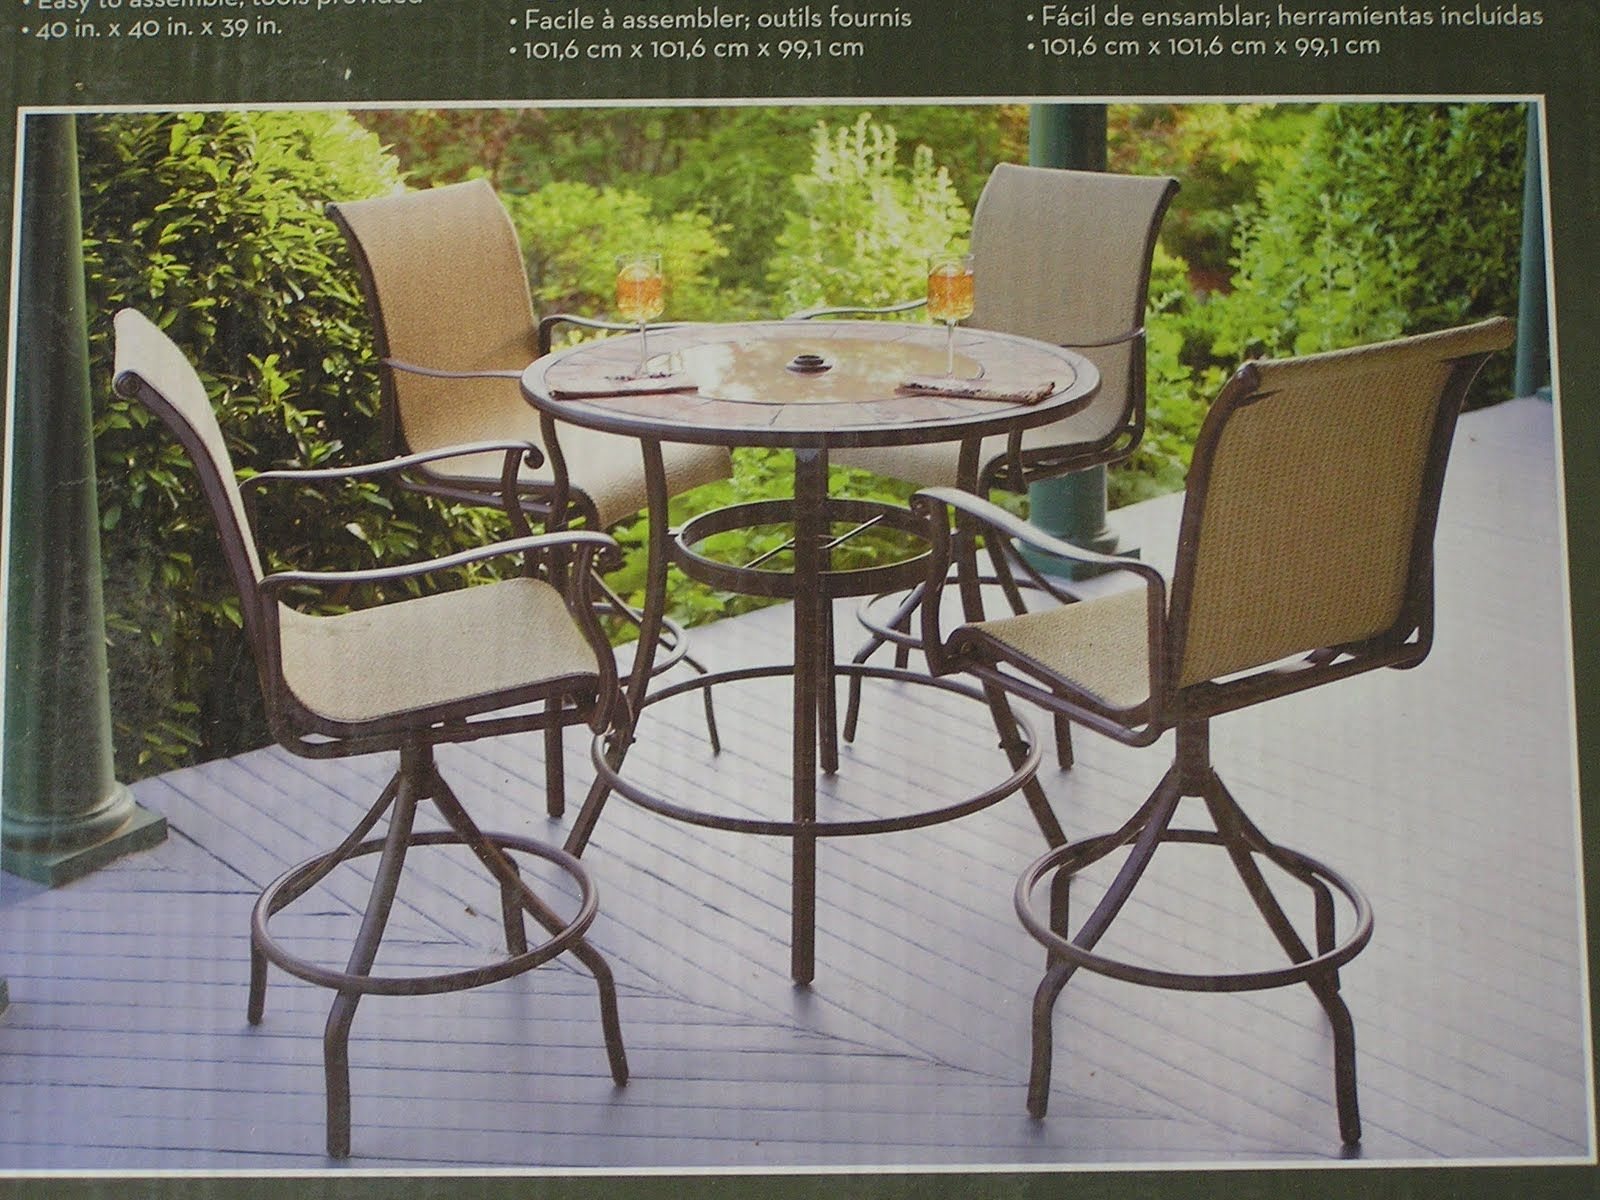 Patio Table And Chair Sets Lowes Cheap Beach Chairs Bar High Hello